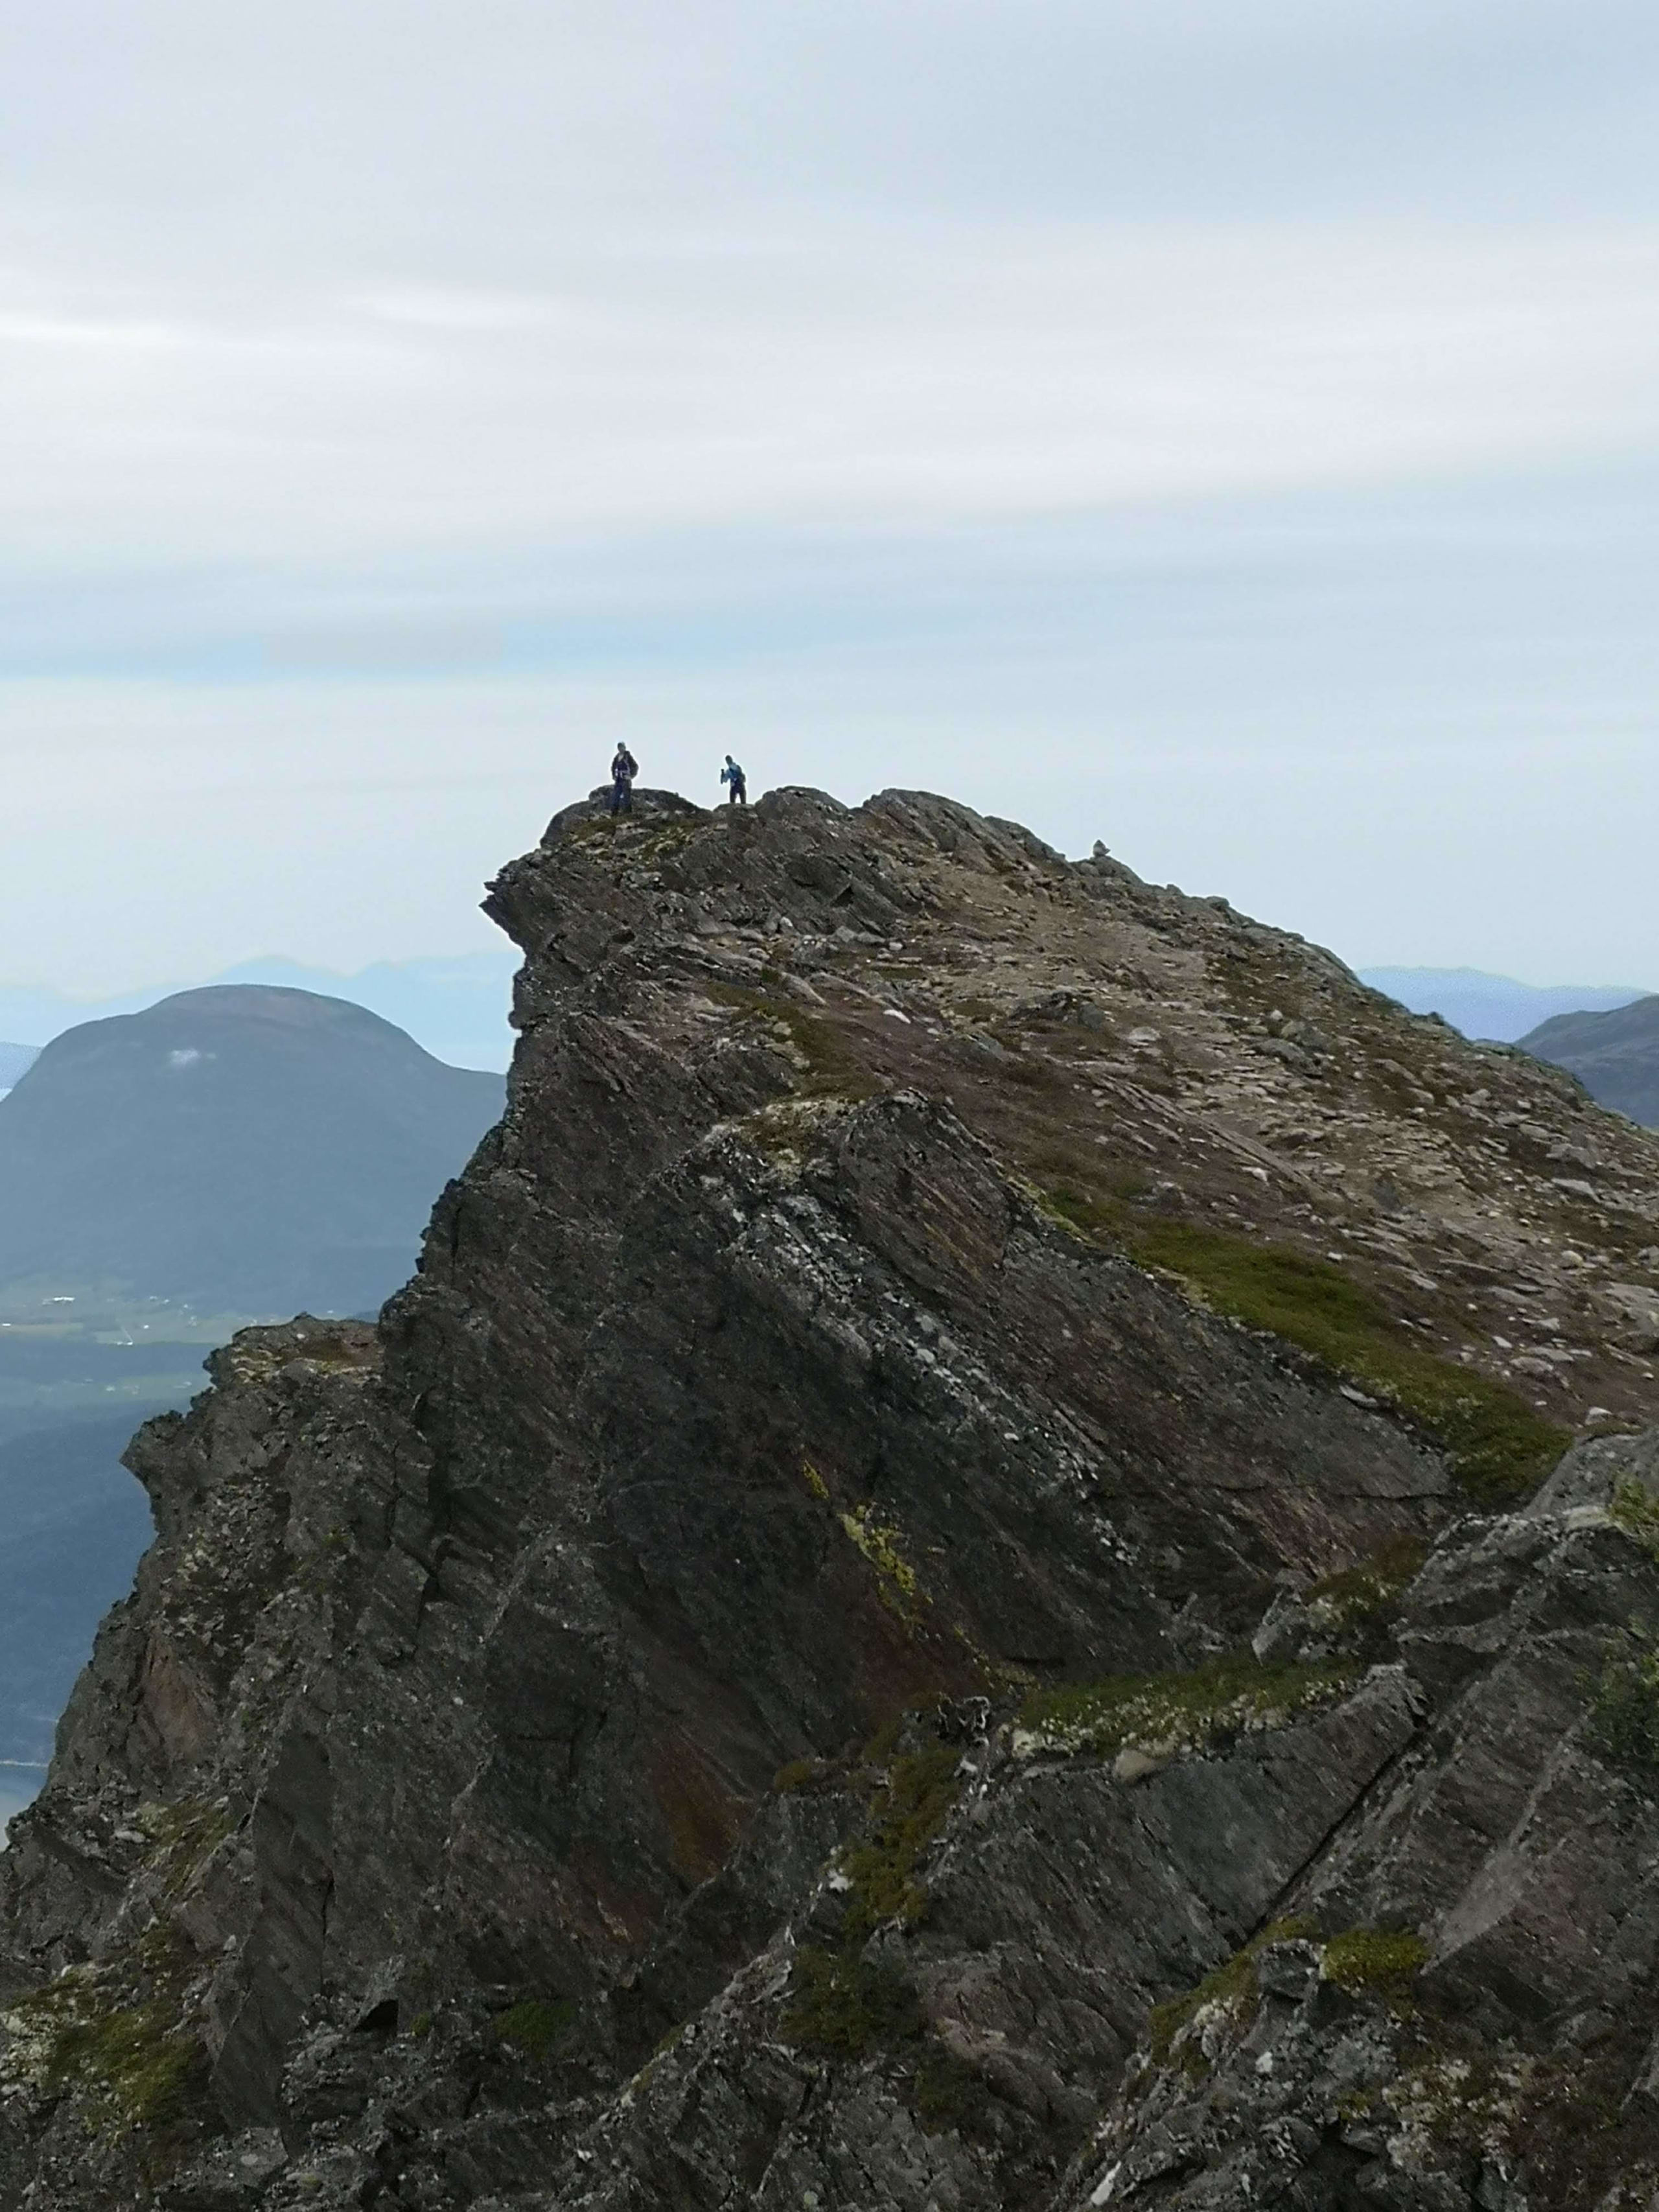 Summit of Romsdalseggen